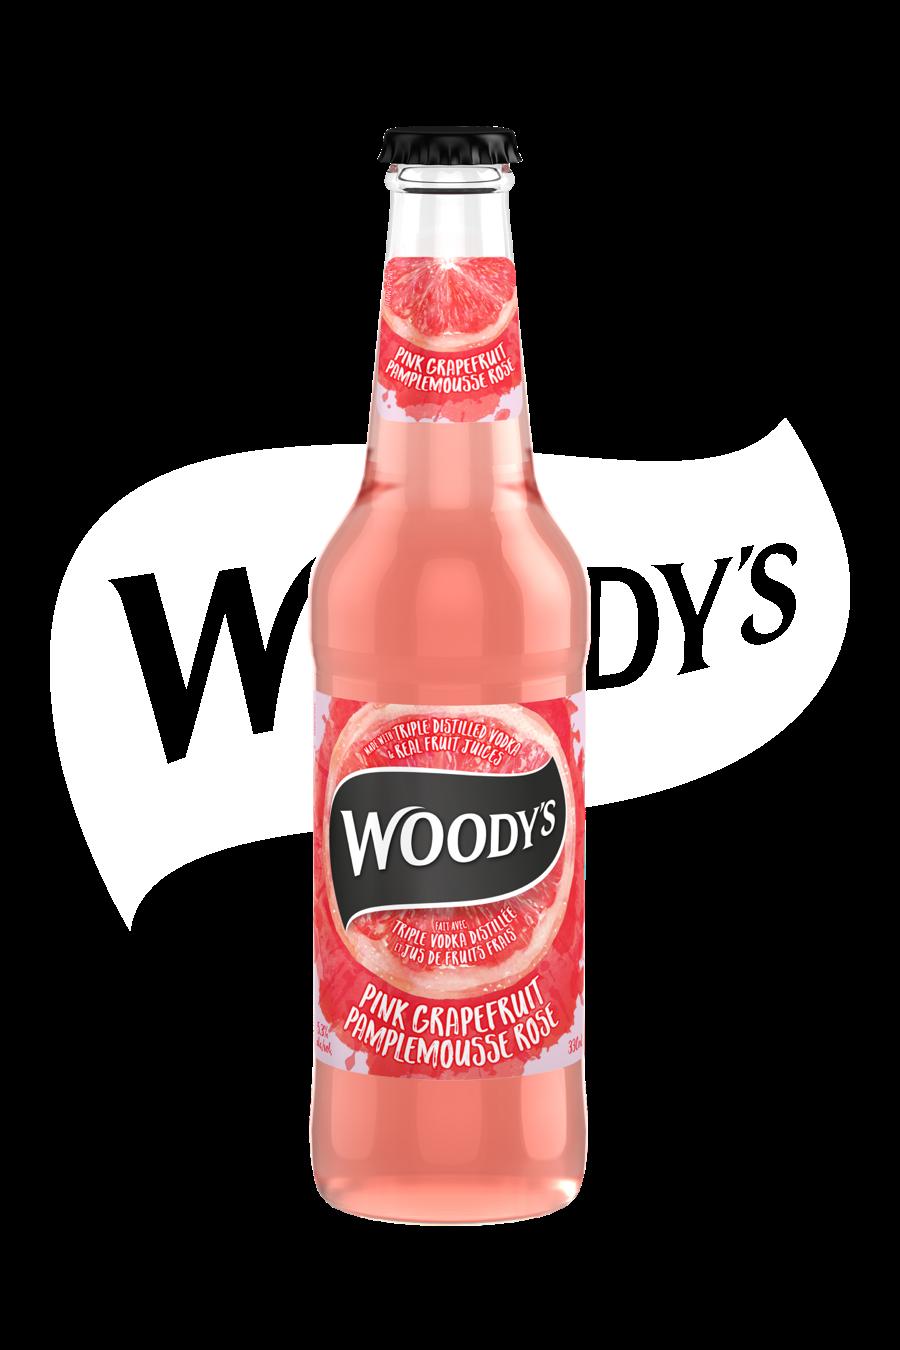 Woodys Brand Image